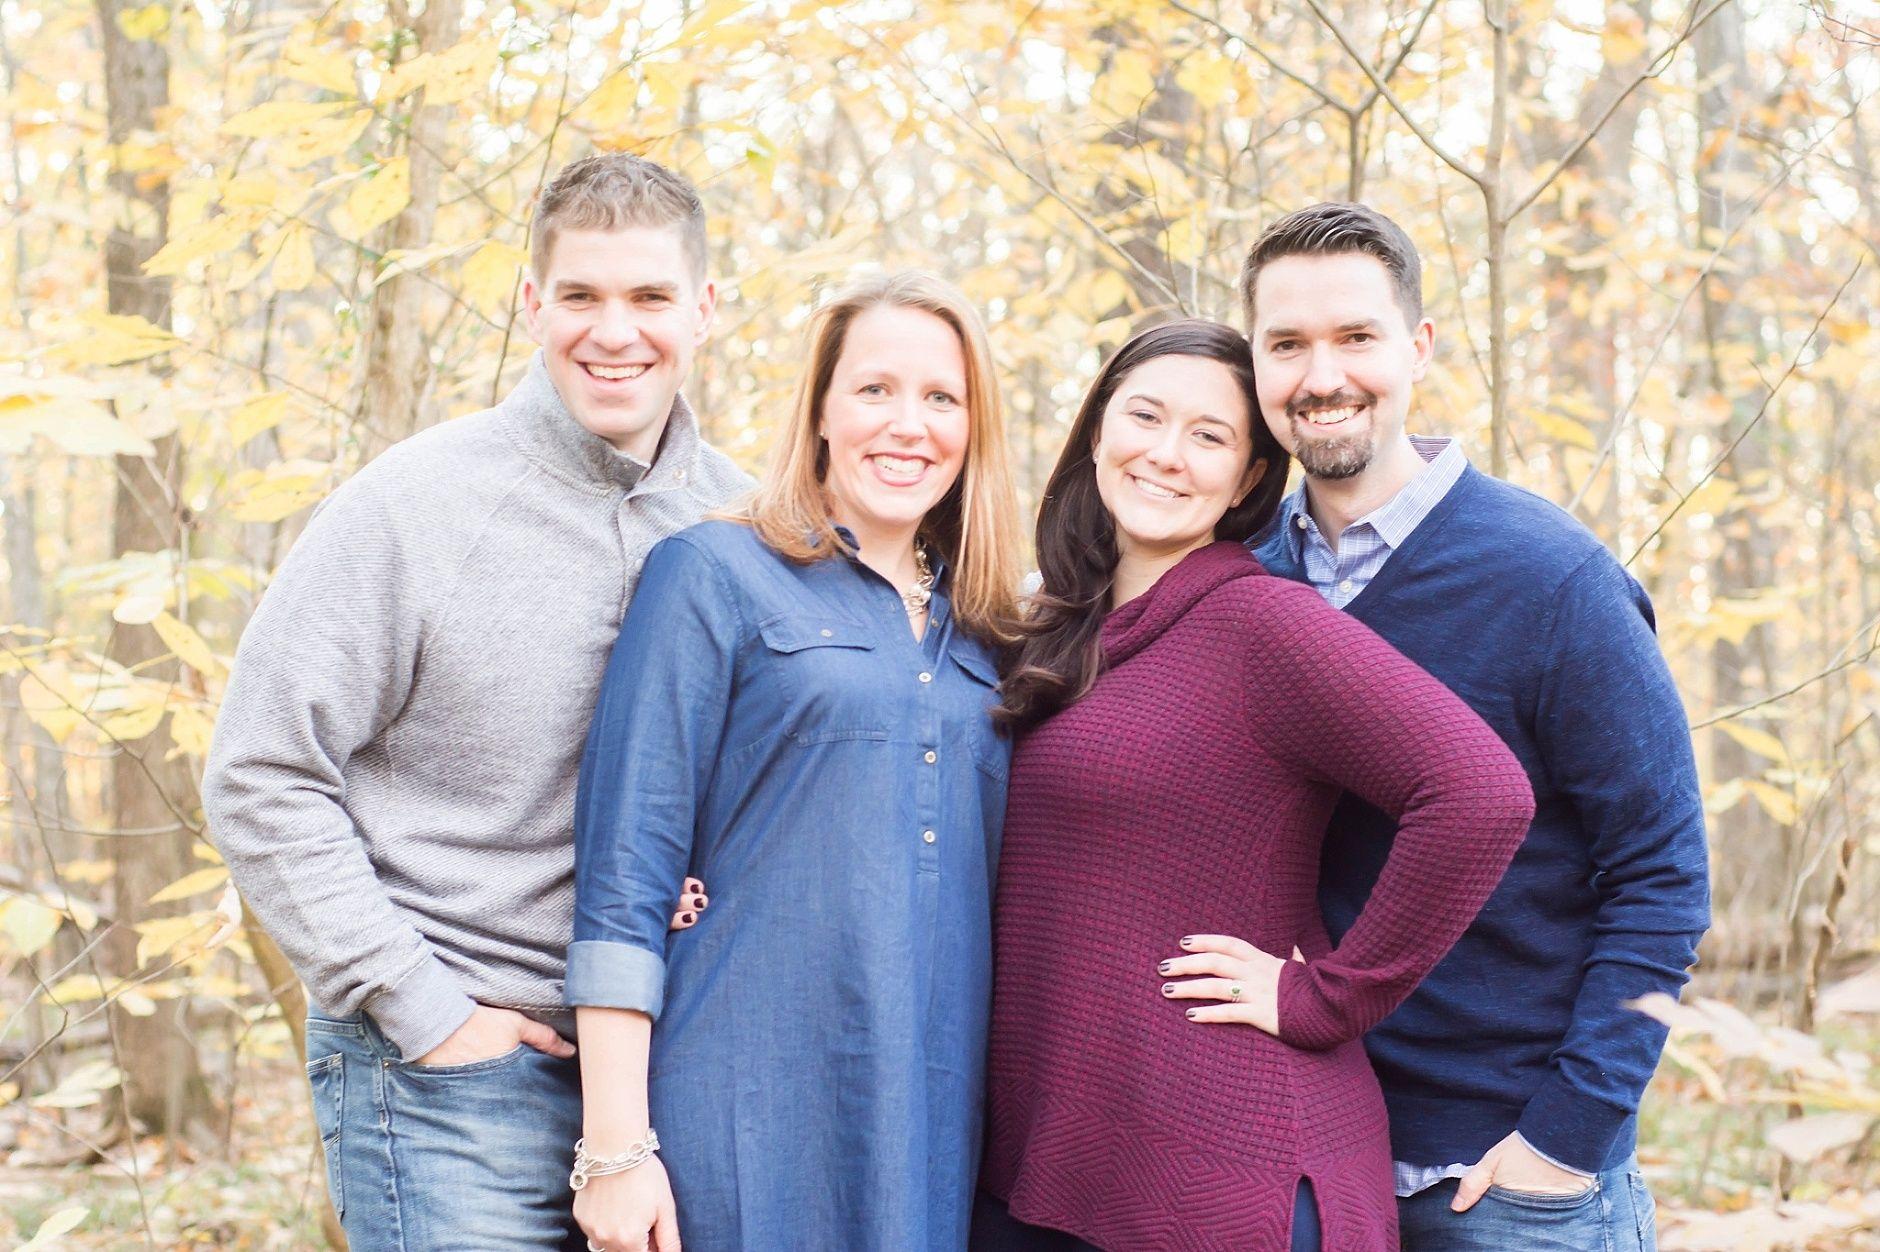 VA family photographer, family photographer, NOVA photographer, K. Dowler photography,  fall family portraits, family portraits, family photography, Bristow VA photographer